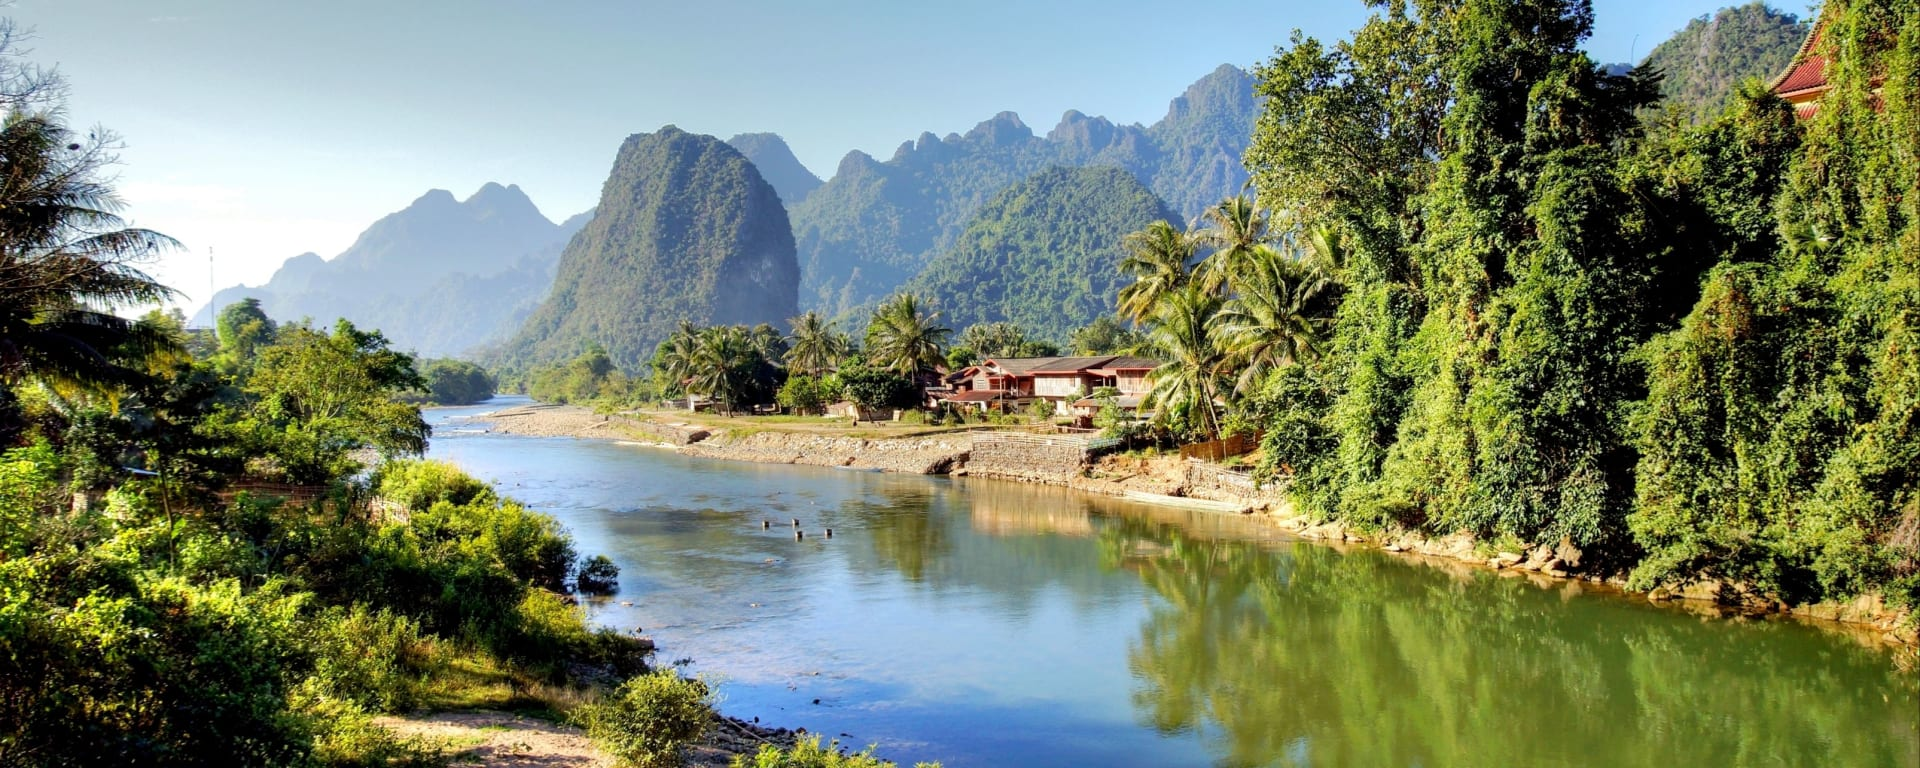 Laos entdecken mit Tischler Reisen: Laos Vang Vieng Song River